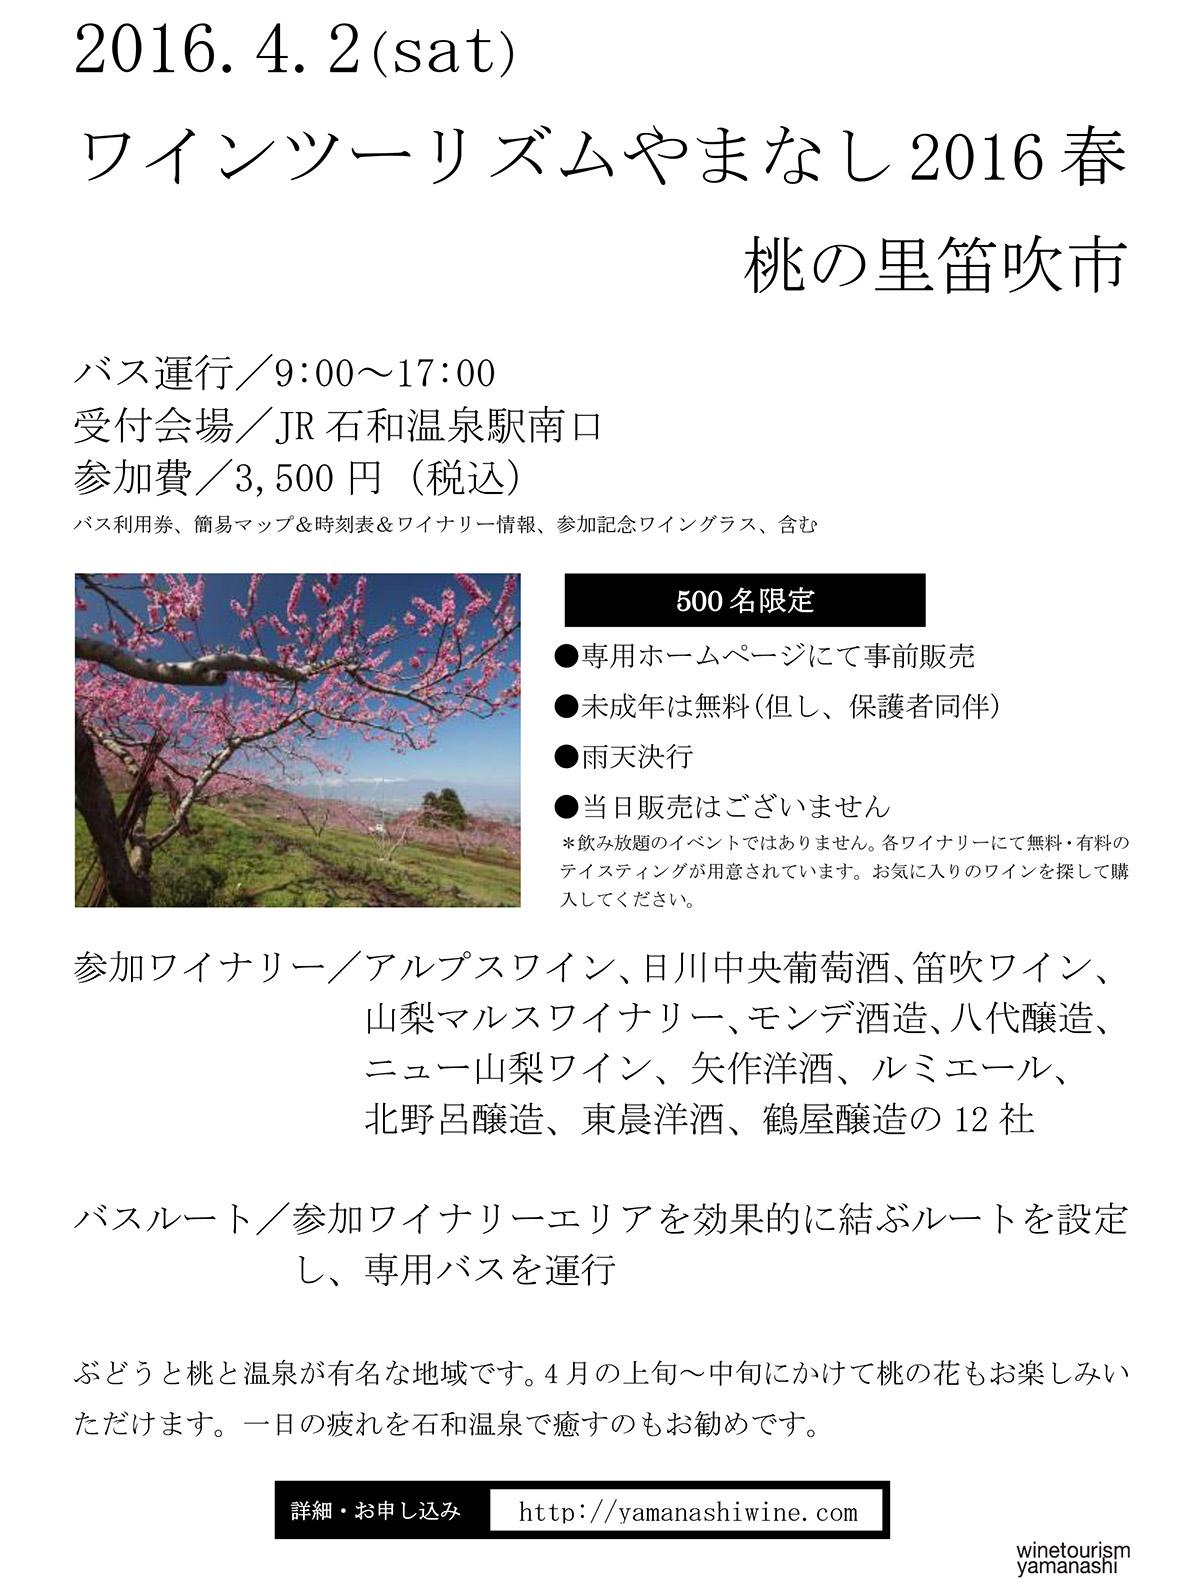 2016spring_wt01